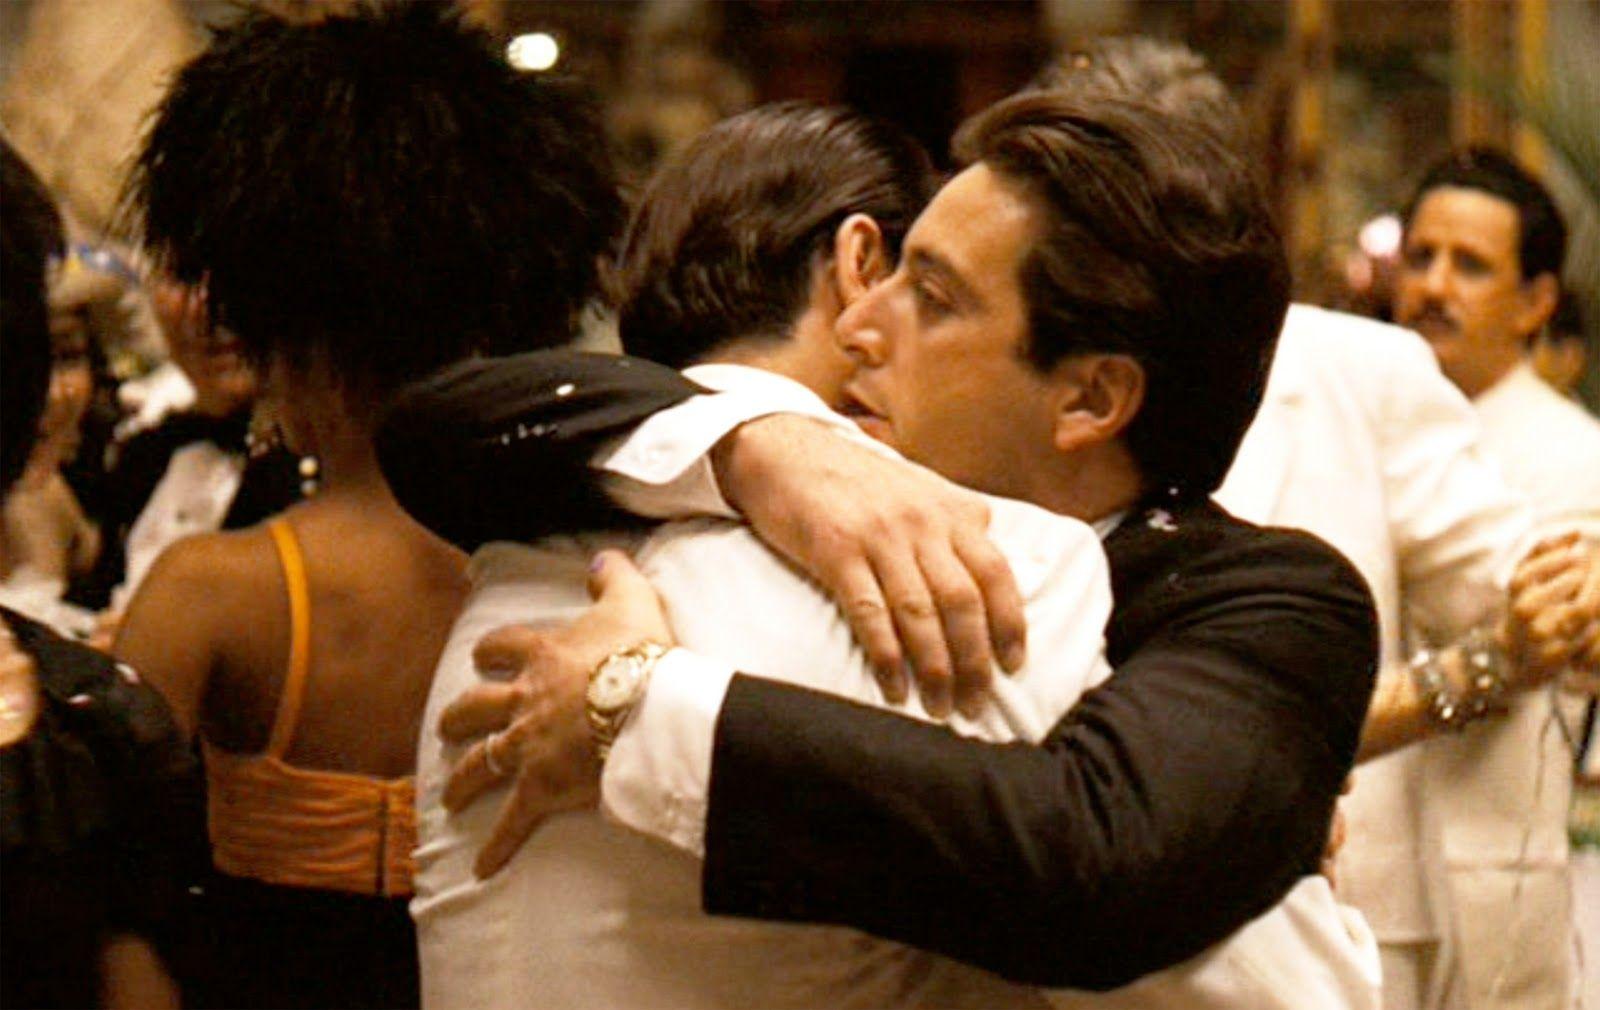 abbracci-cinema-film-pacino-padrino